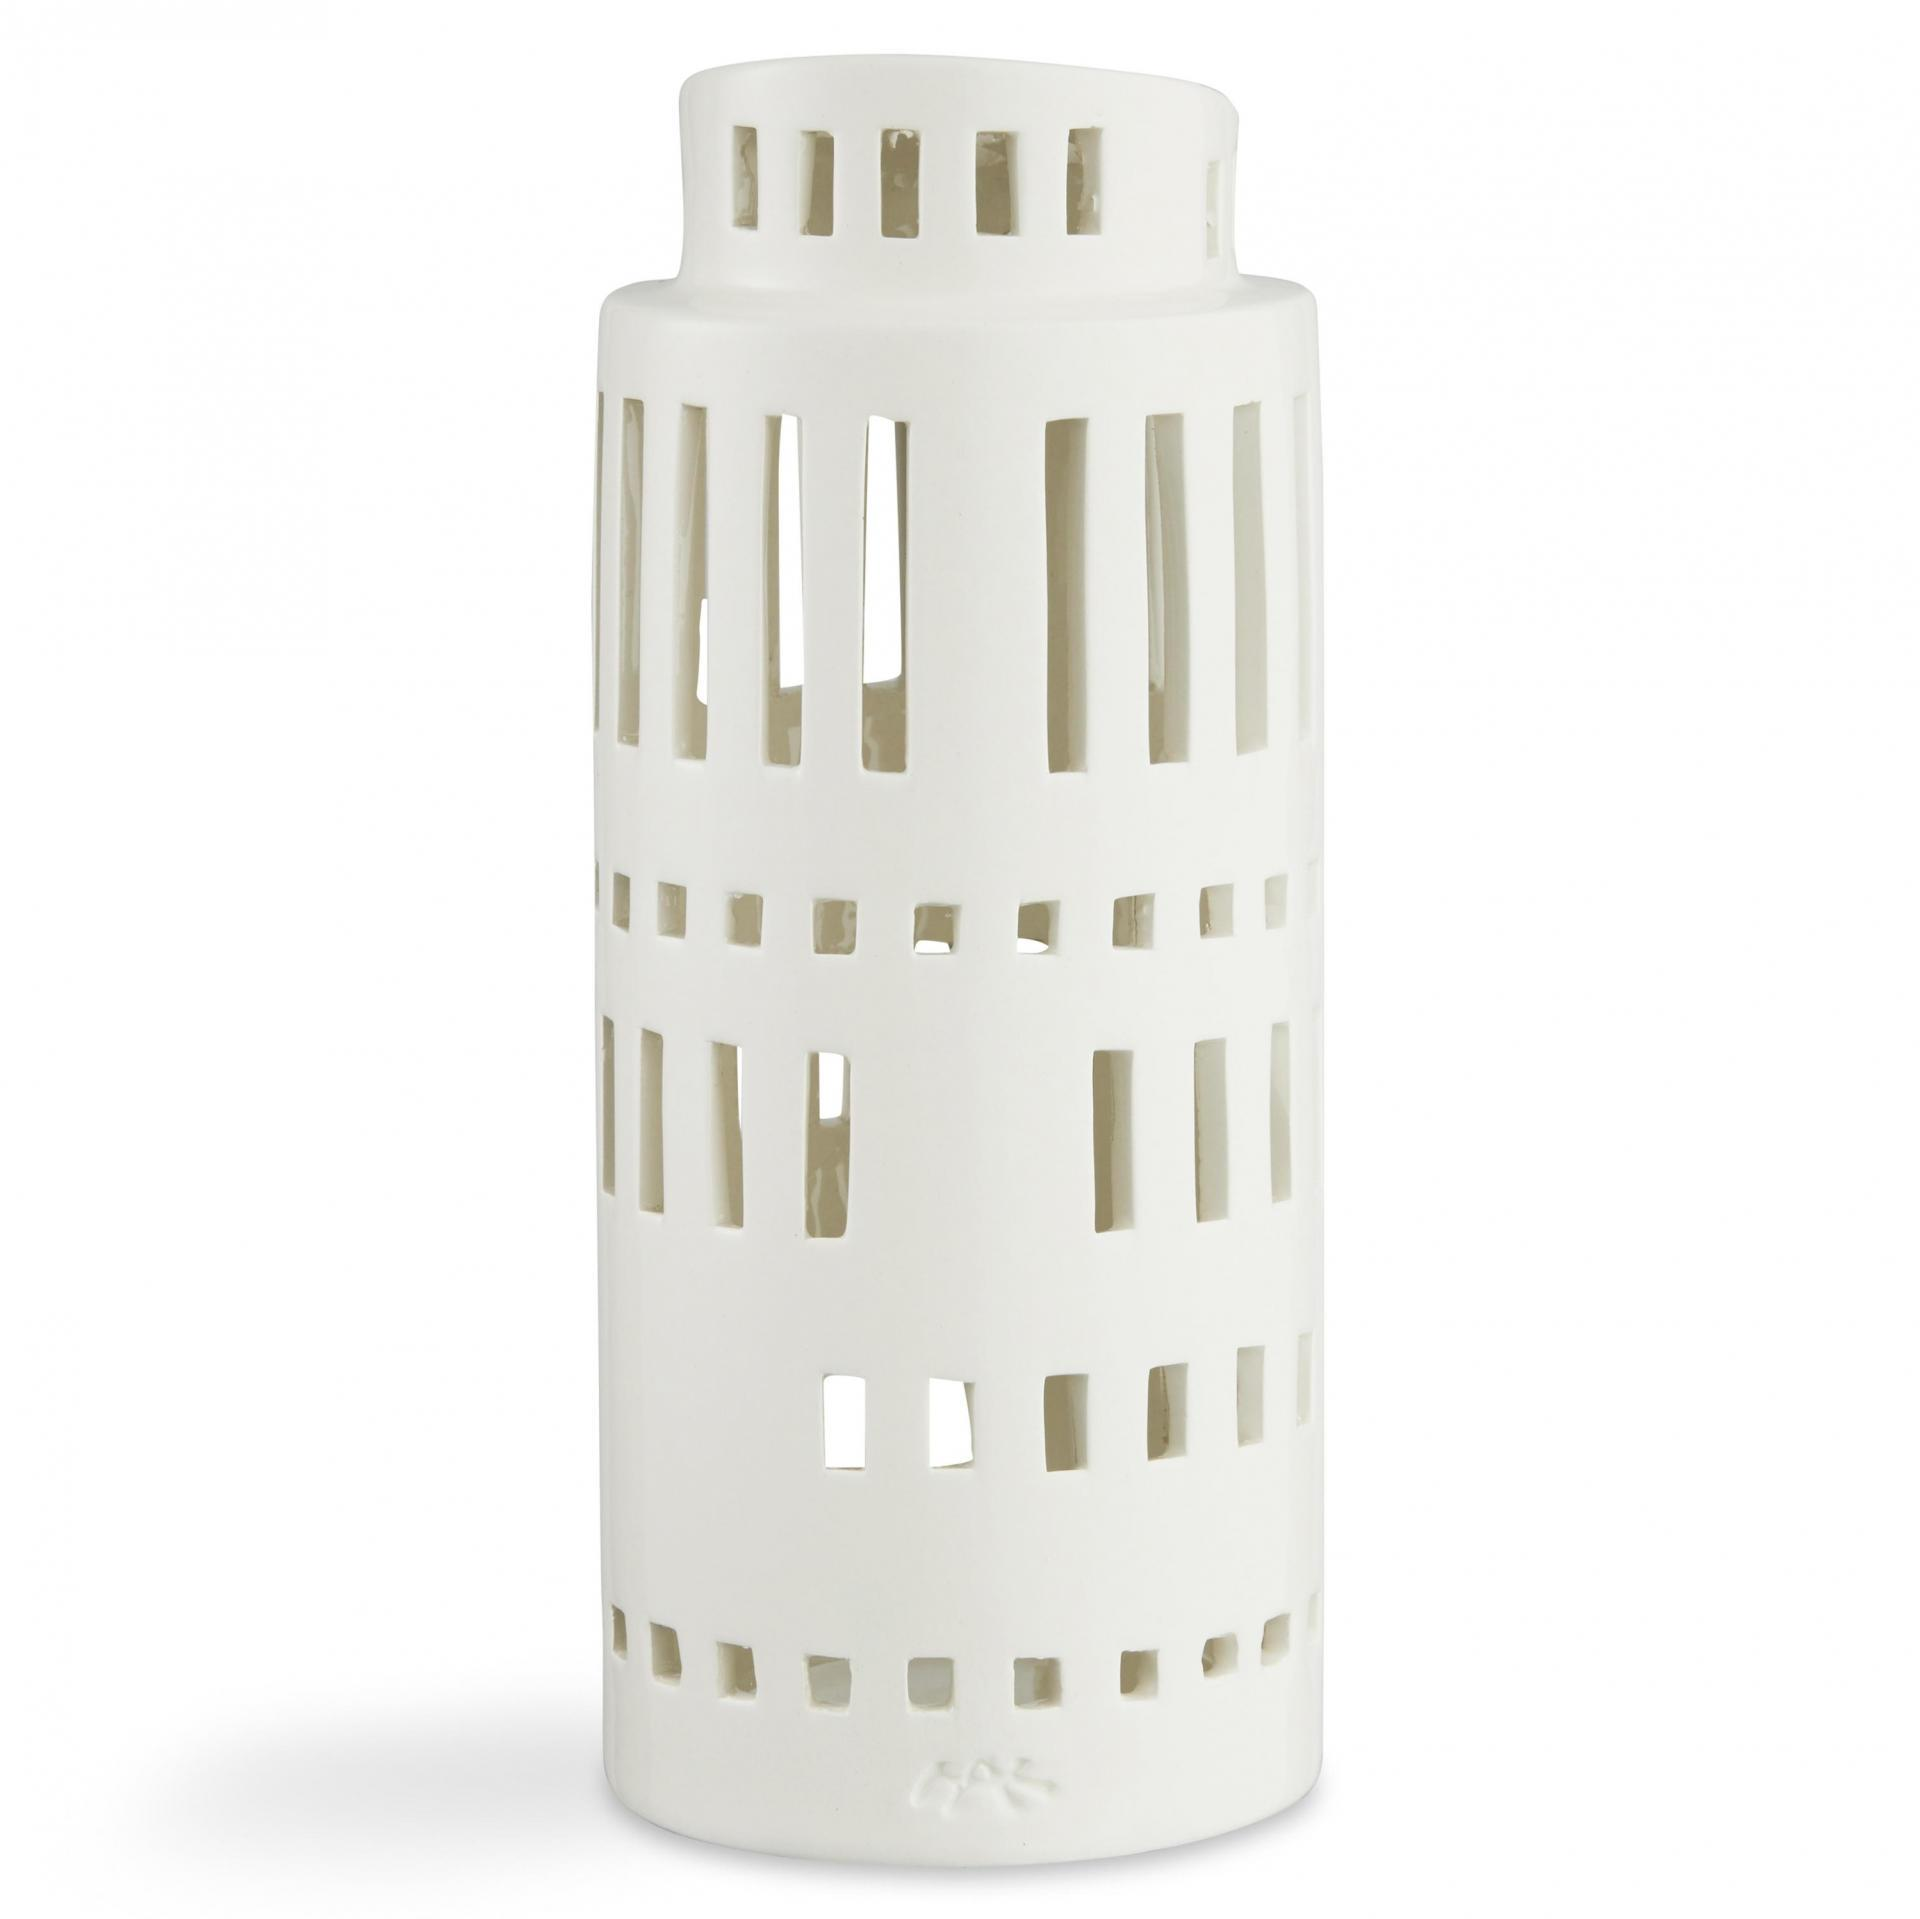 KÄHLER Lucerna domeček Urbania Light 22 cm, bílá barva, keramika